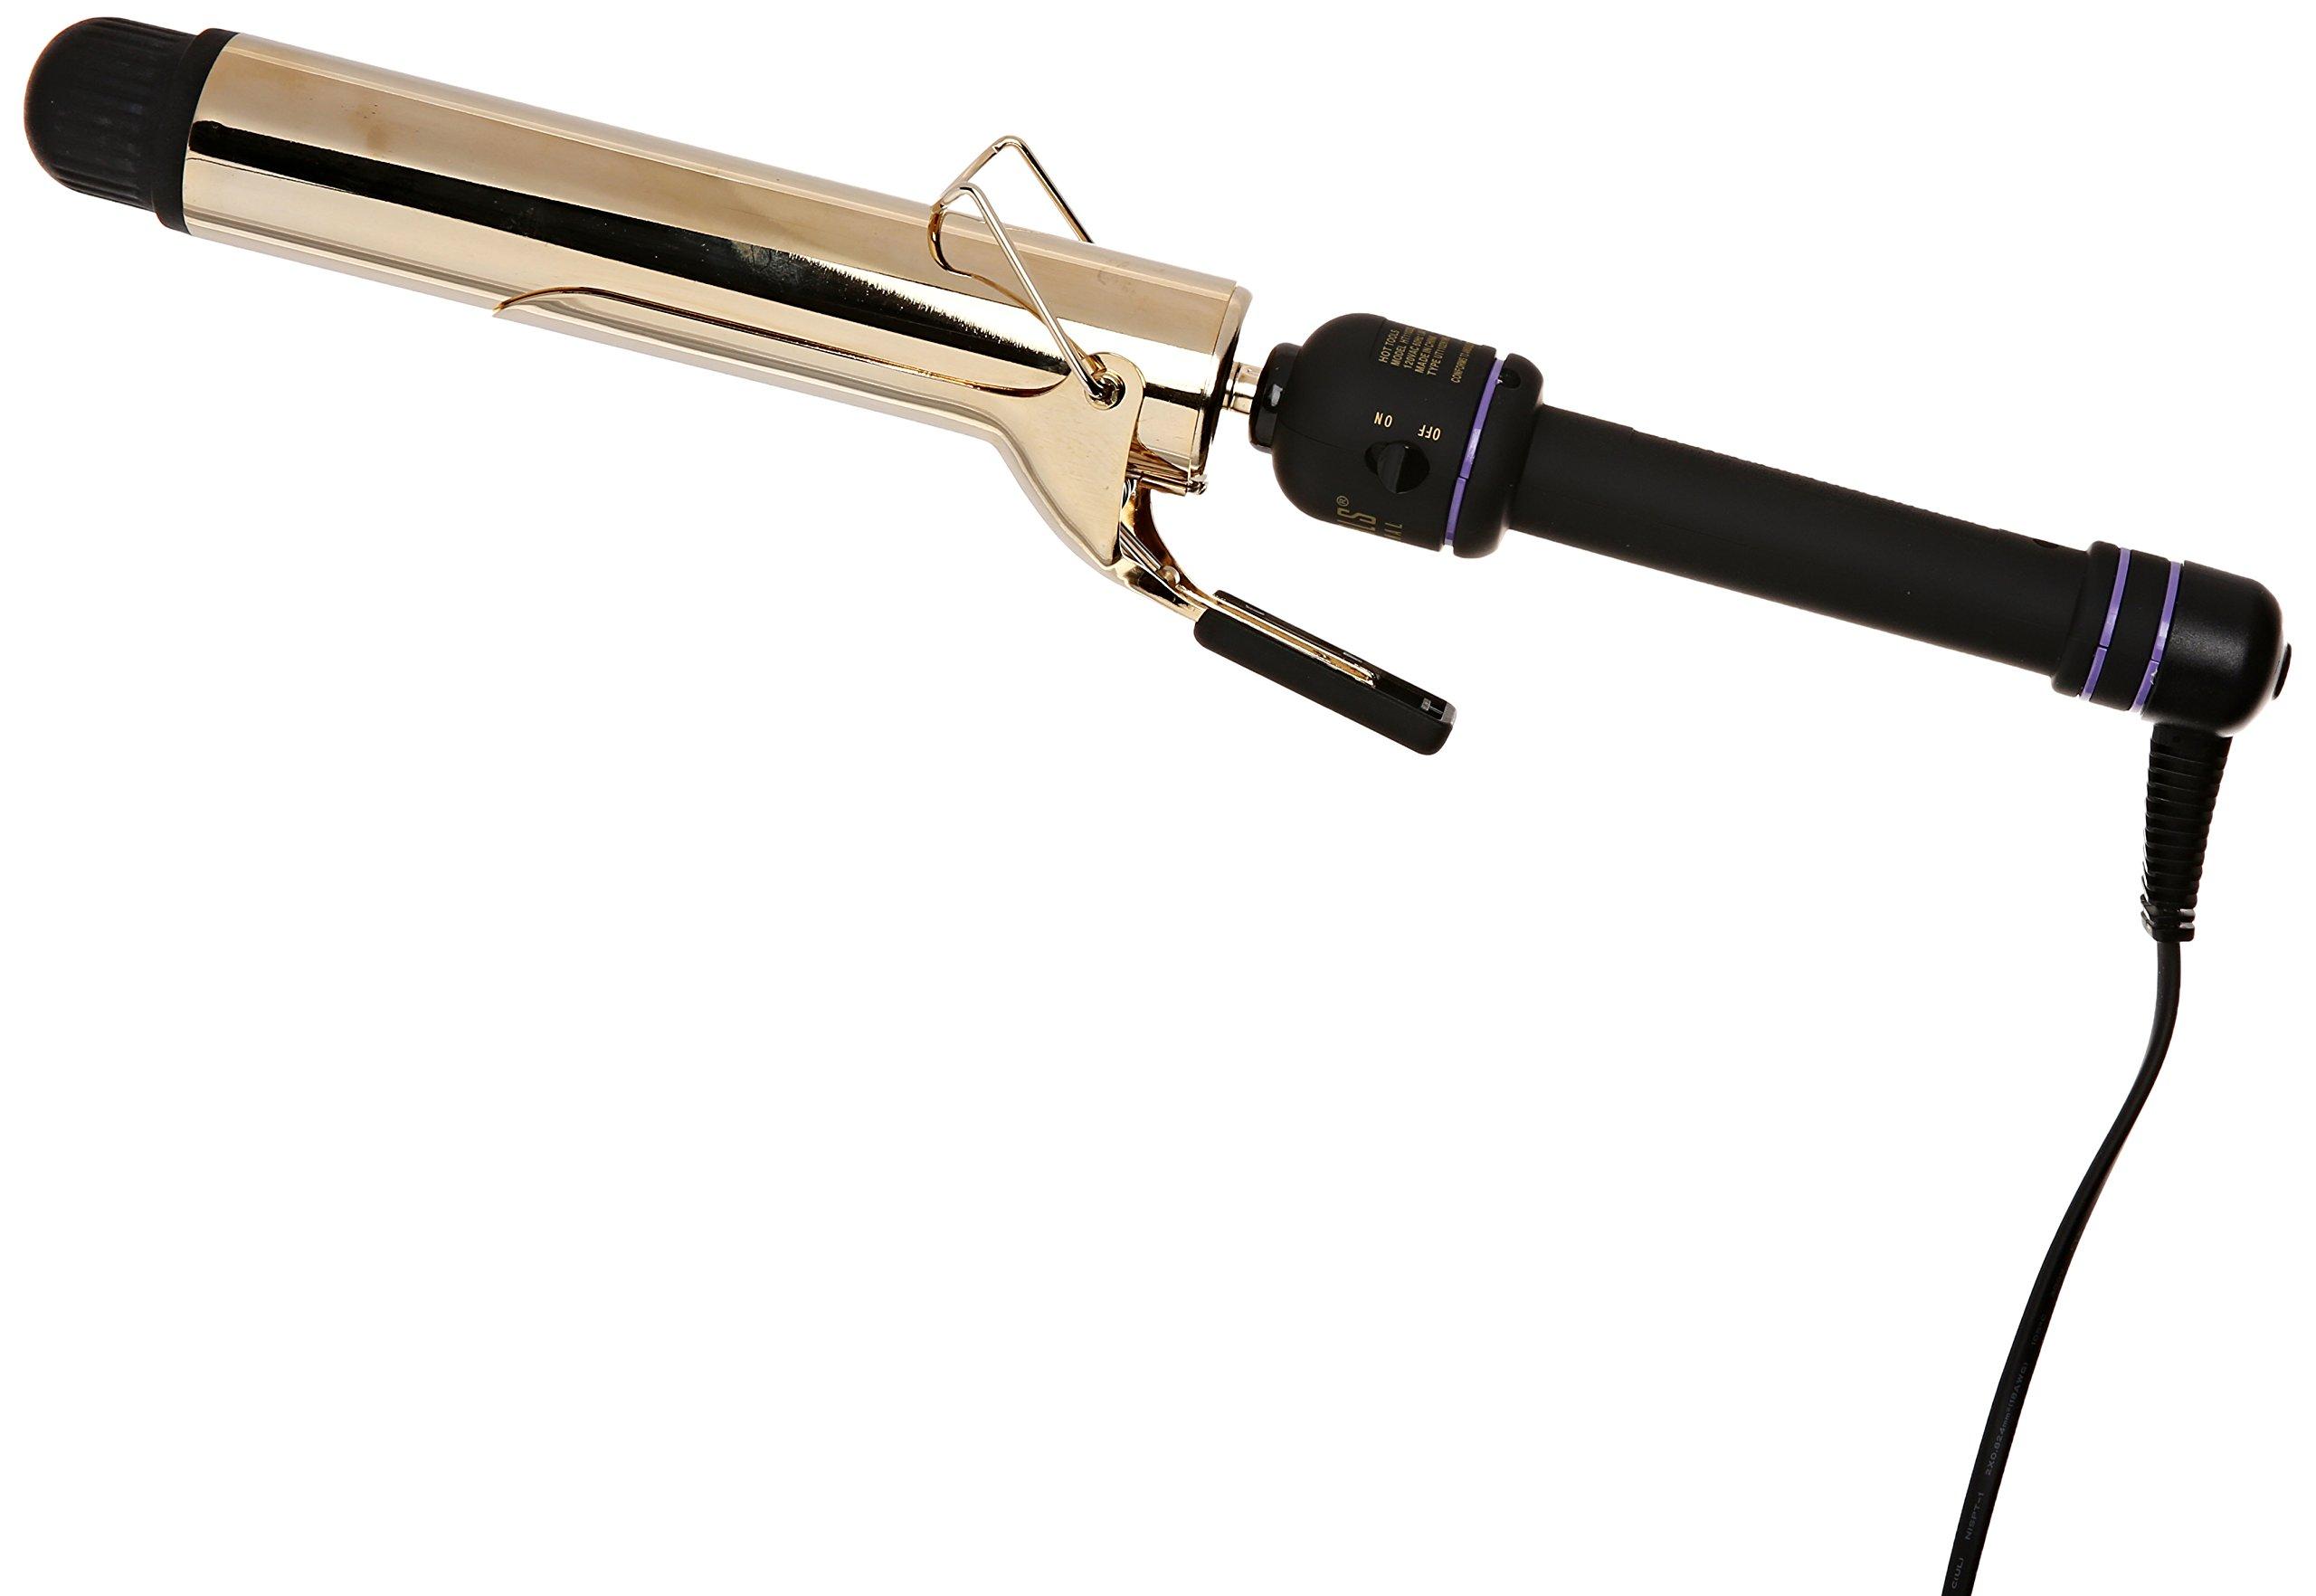 Hot Tools Salon Curling Iron XL Barrel 24k Gold -HT1102XL, 1-1/2 Inch